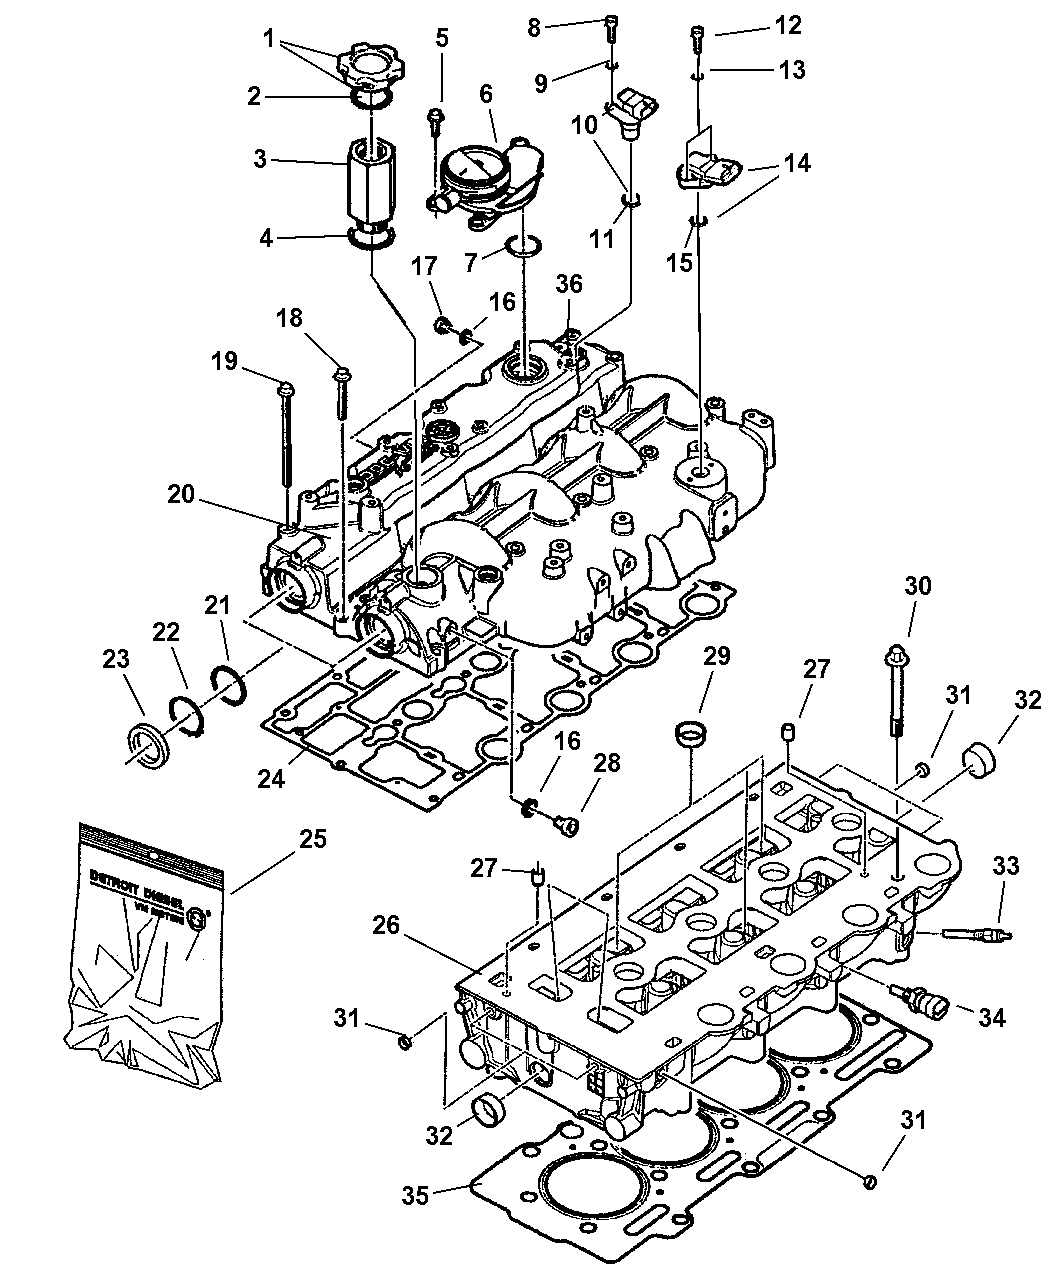 Jeep Liberty 3 7 Engine Diagram 6 Cylinder